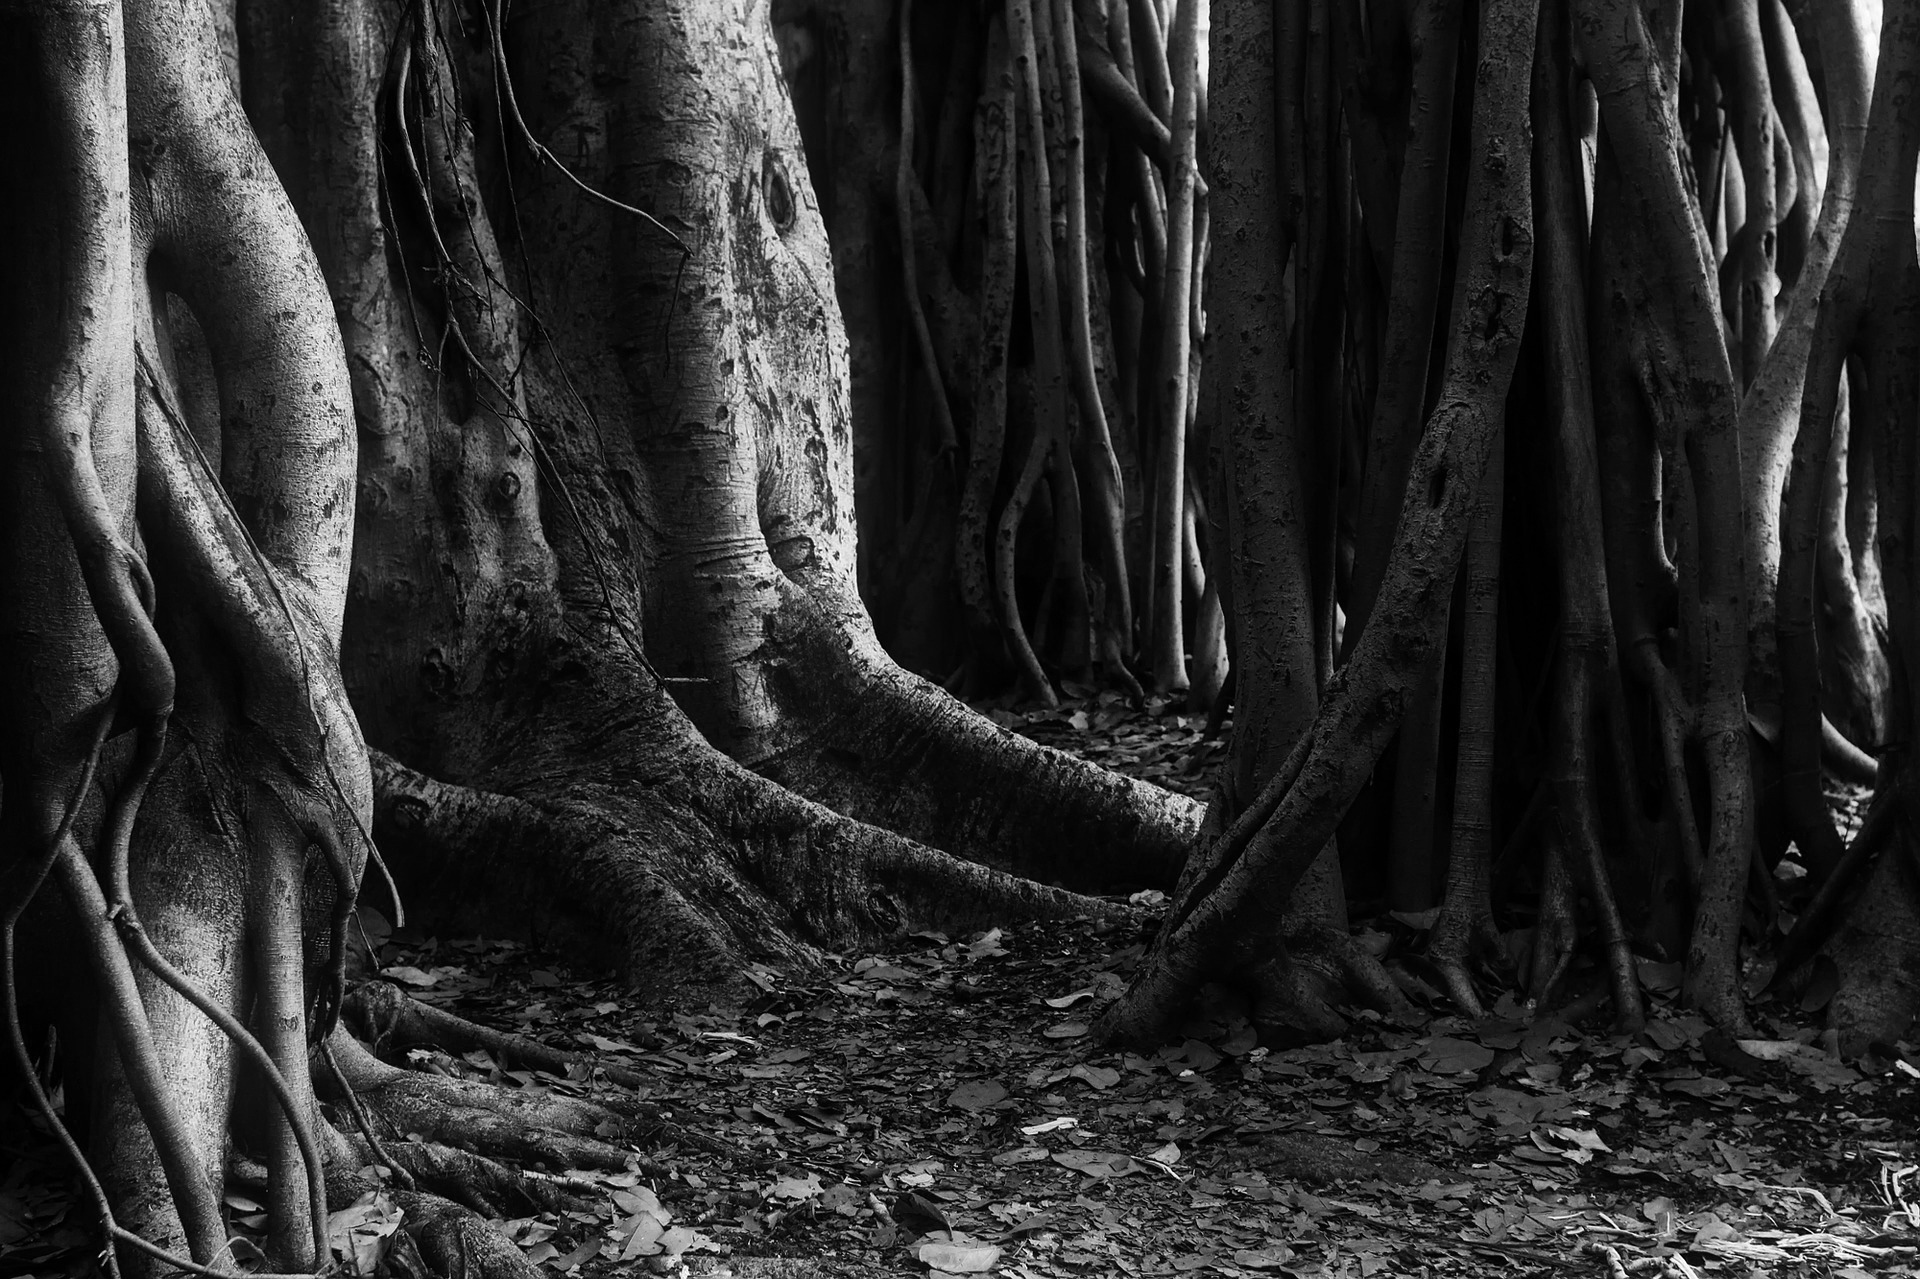 trees-2263344_1920.jpg